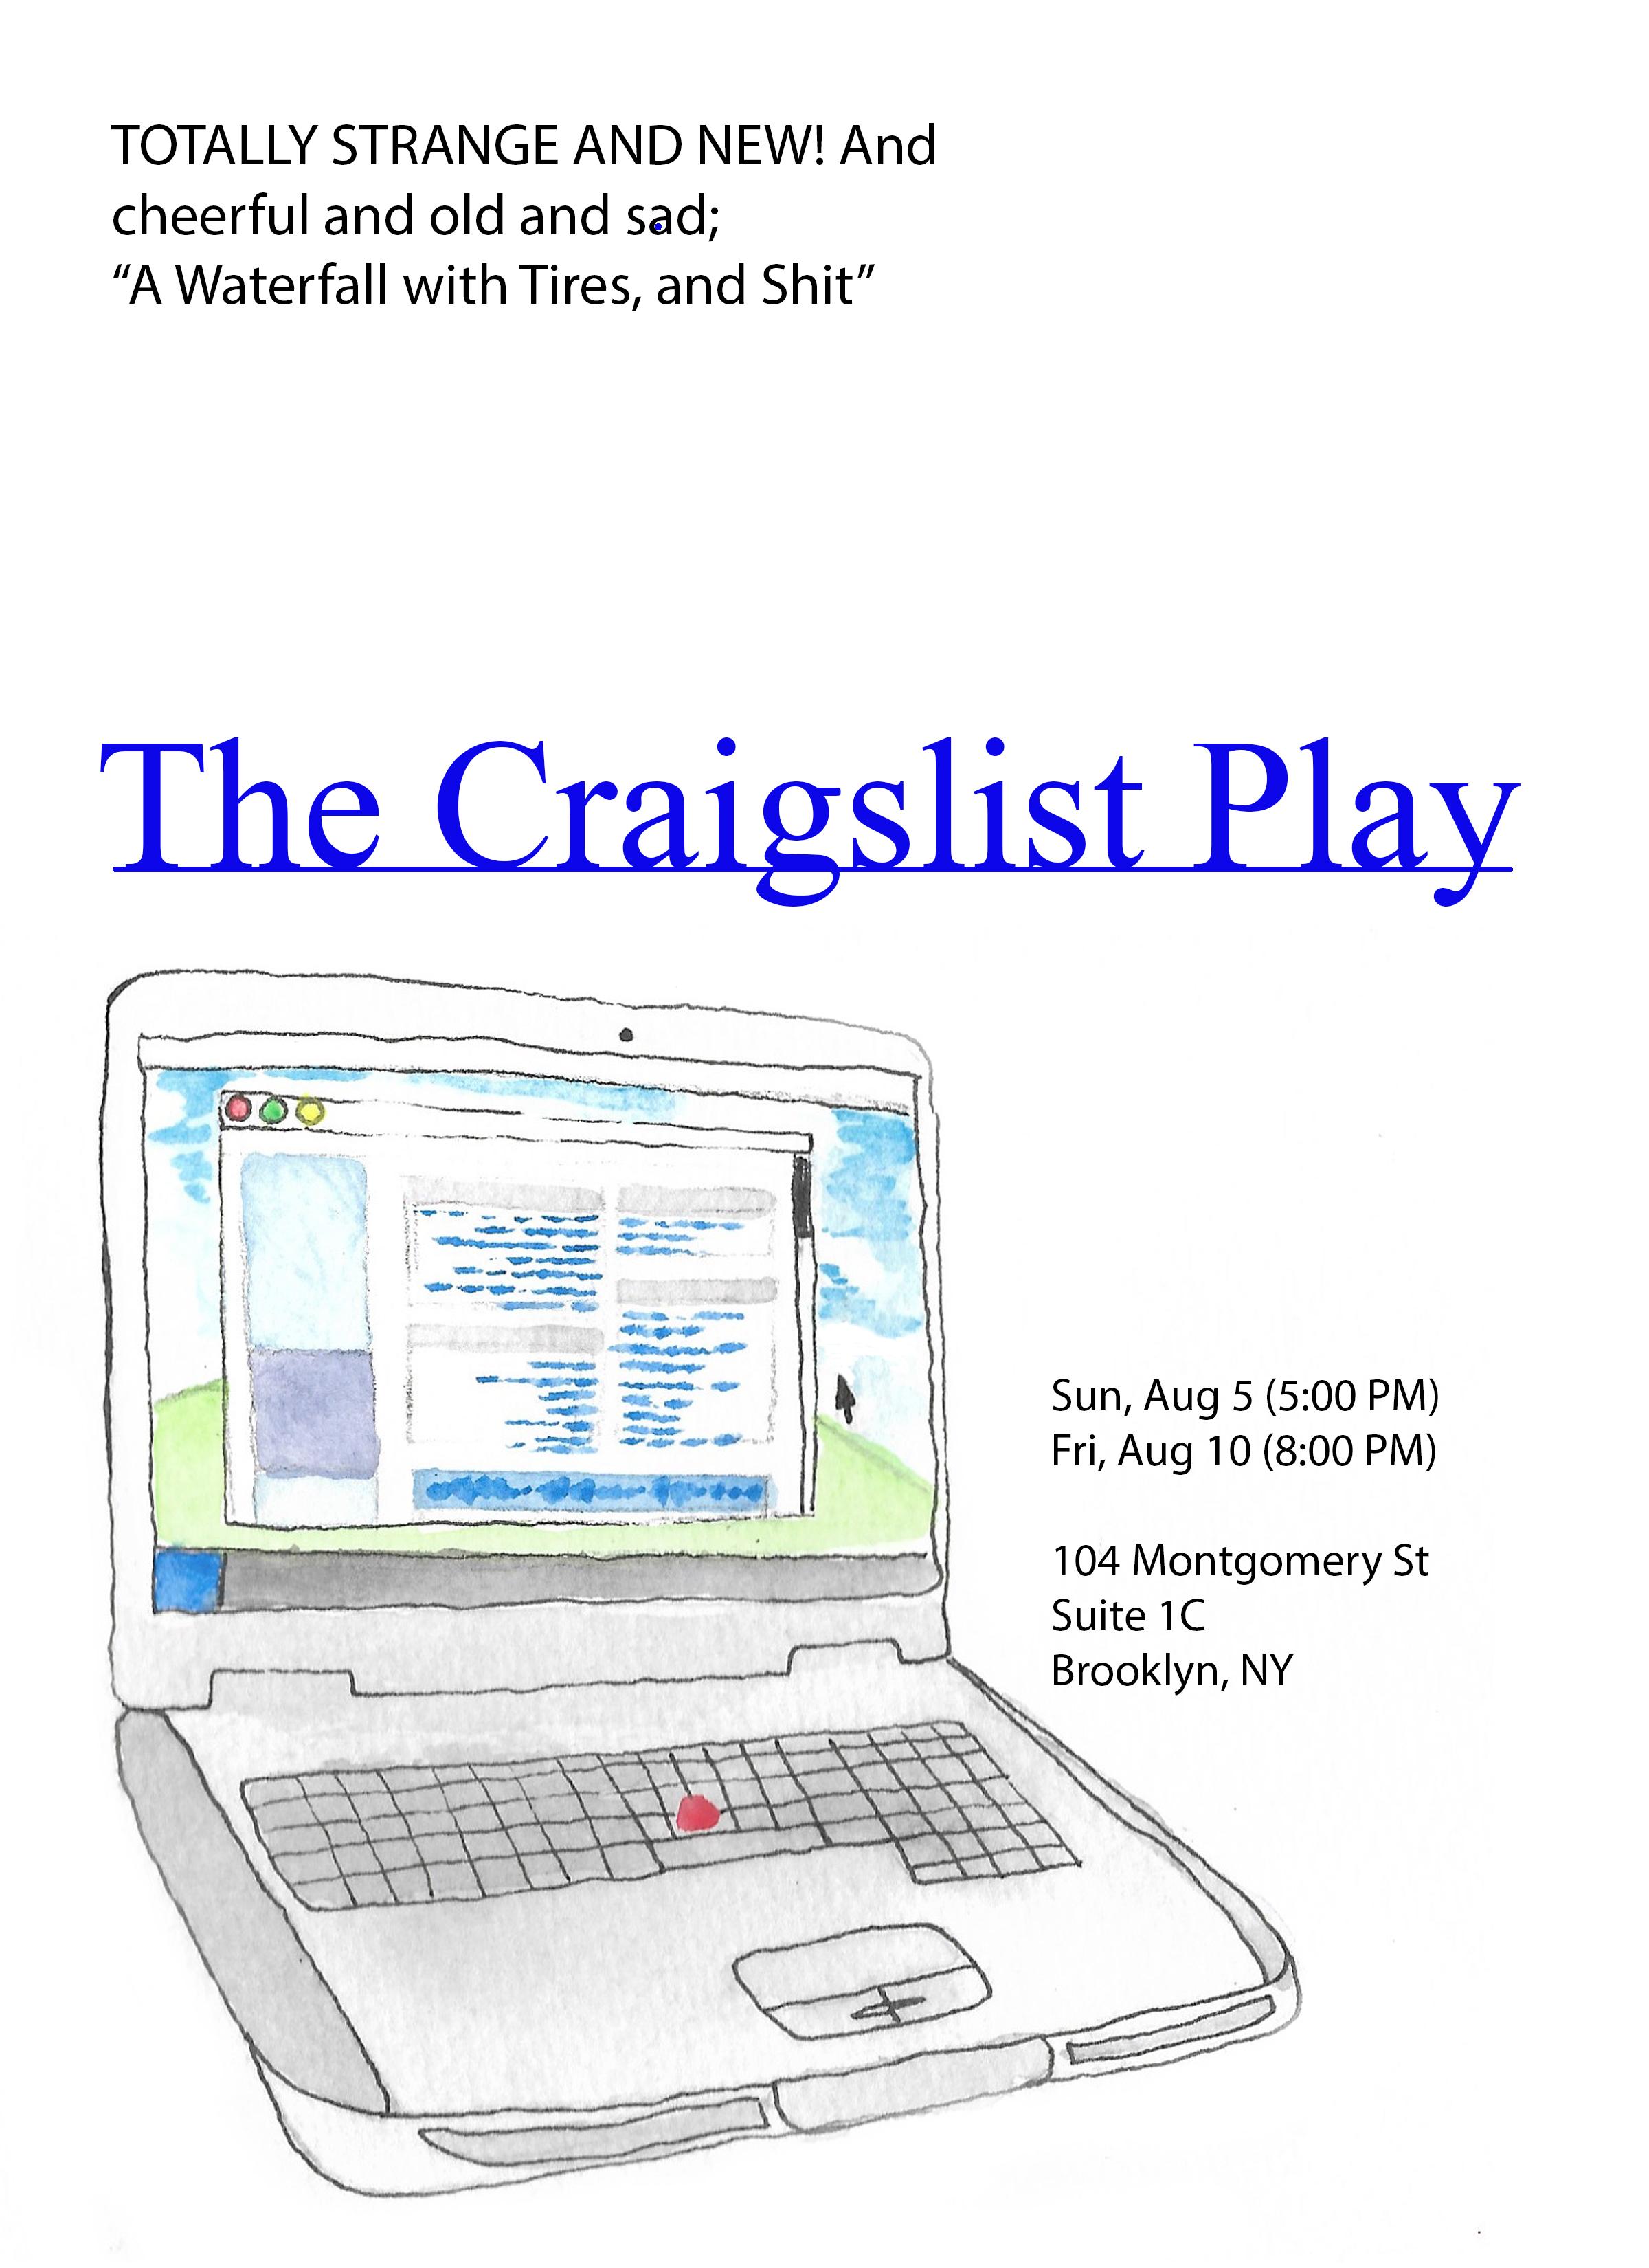 The Craigslist Play